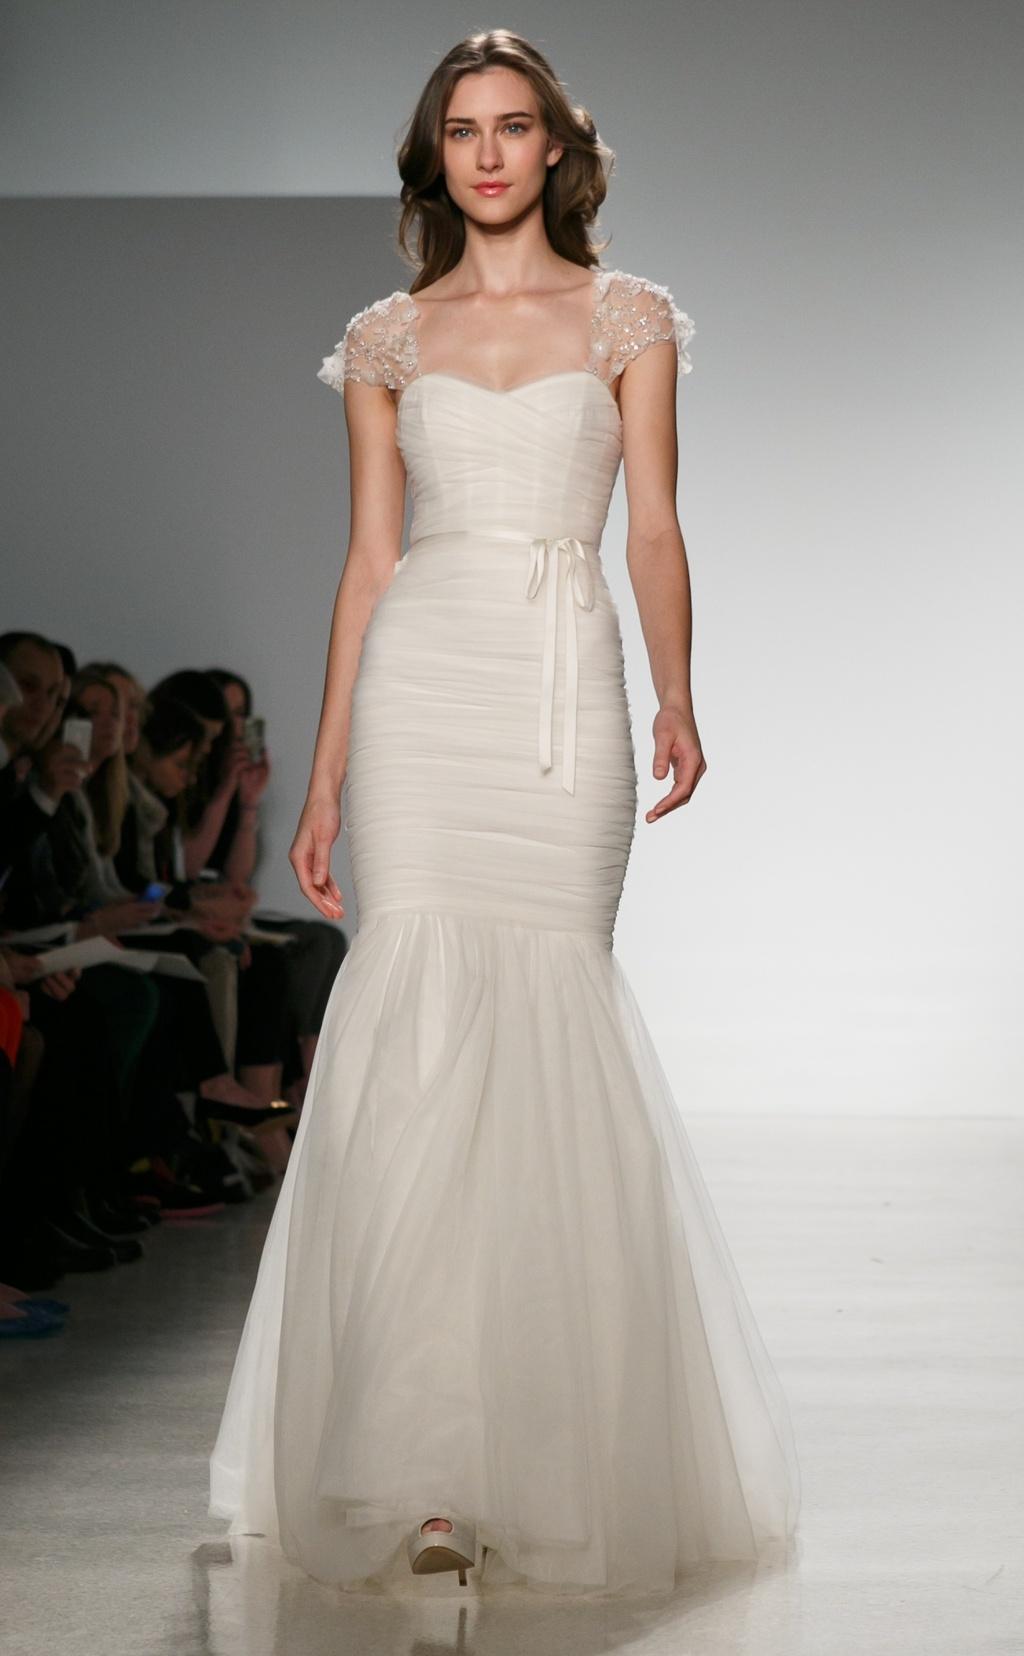 Christos-wedding-dress-spring-2014-bridal-1b.full